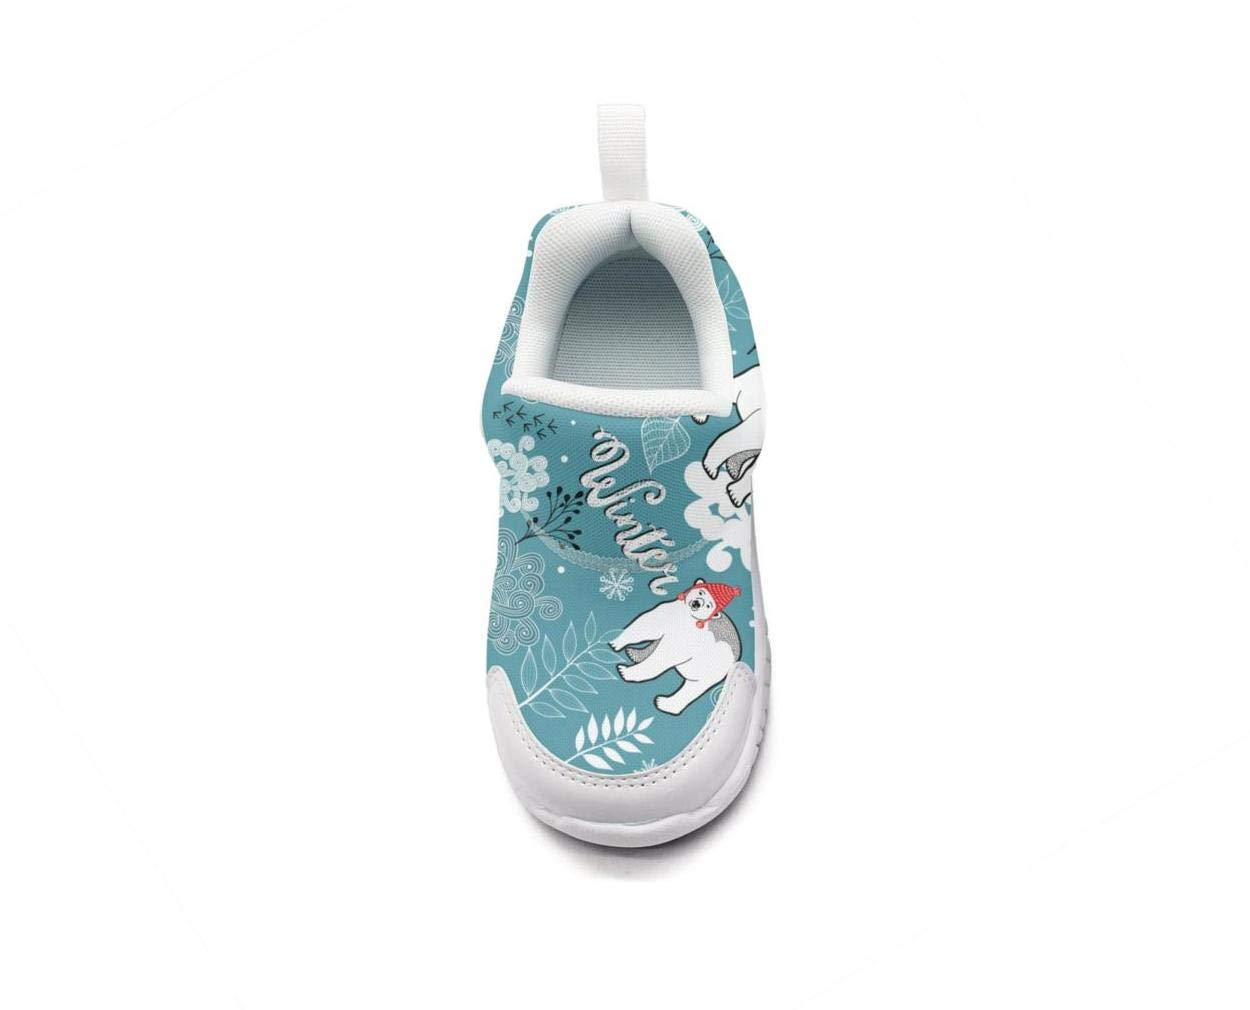 ONEYUAN Children Winter Frozen Forest Polar Bear Kid Casual Lightweight Sport Shoes Sneakers Walking Athletic Shoes